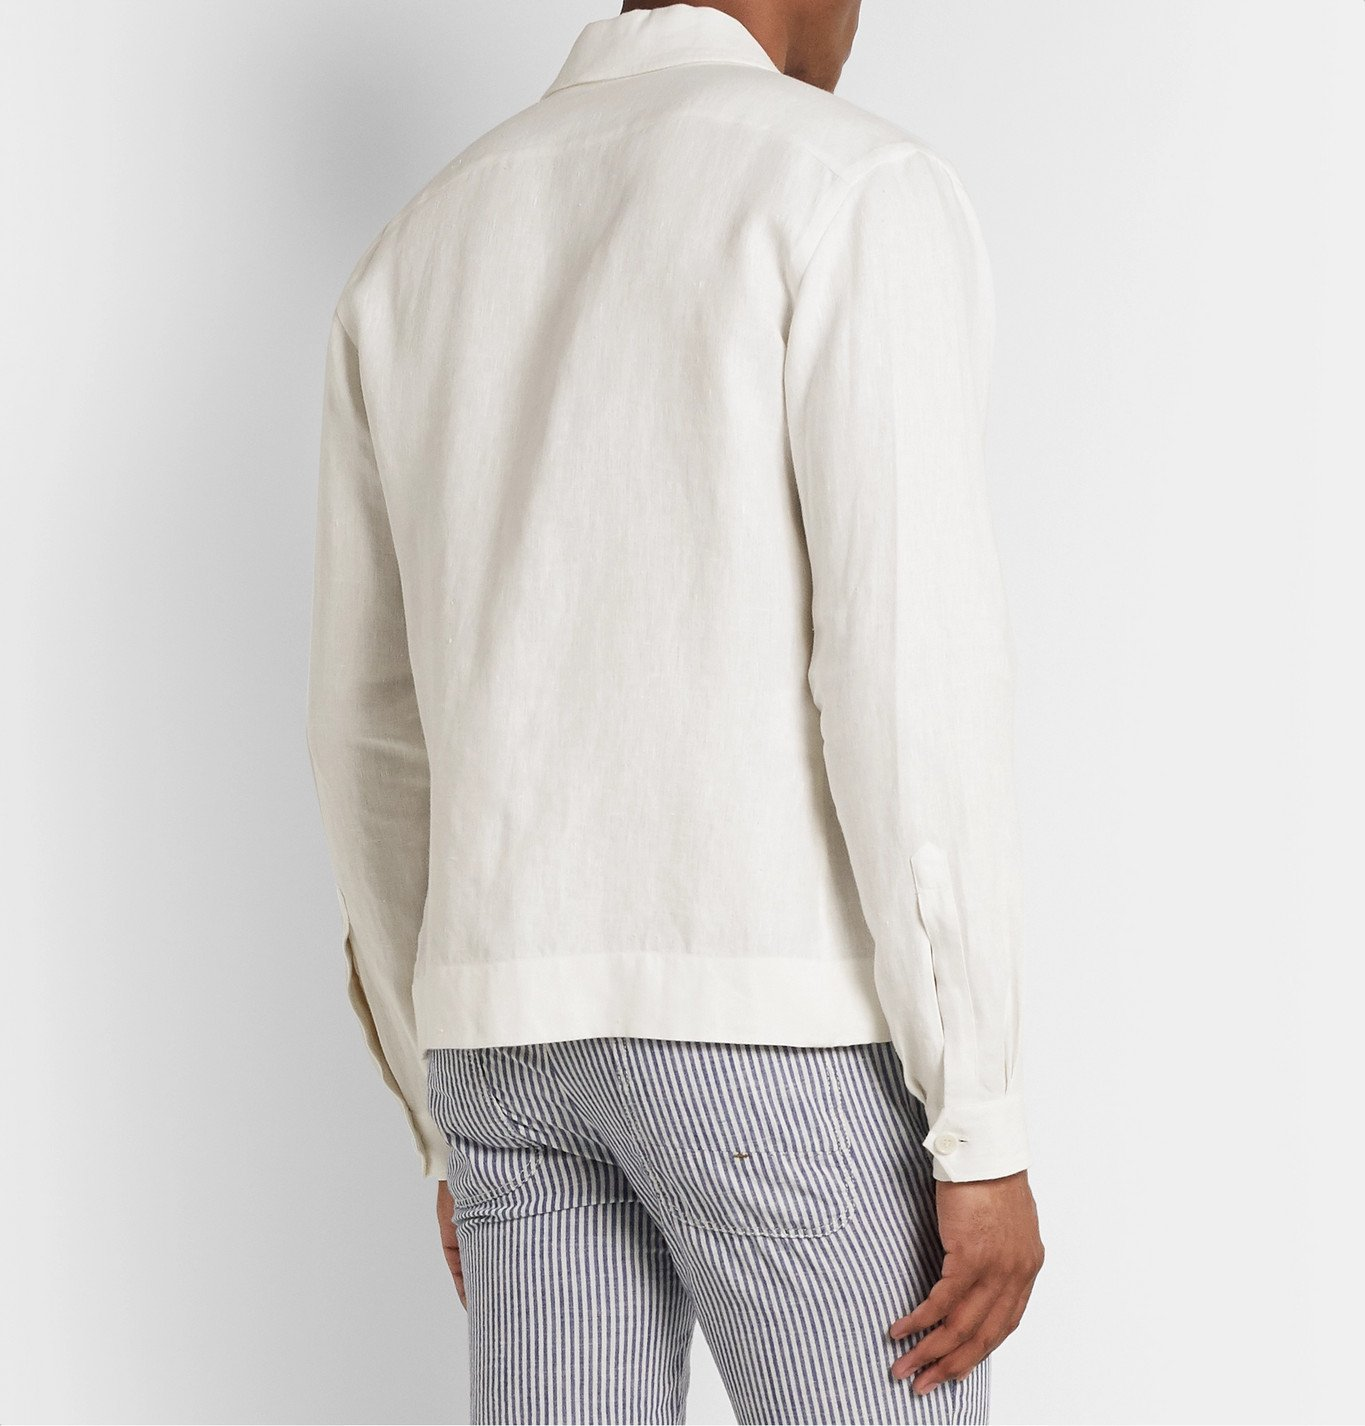 De Petrillo - Linen Bomber Jacket - White